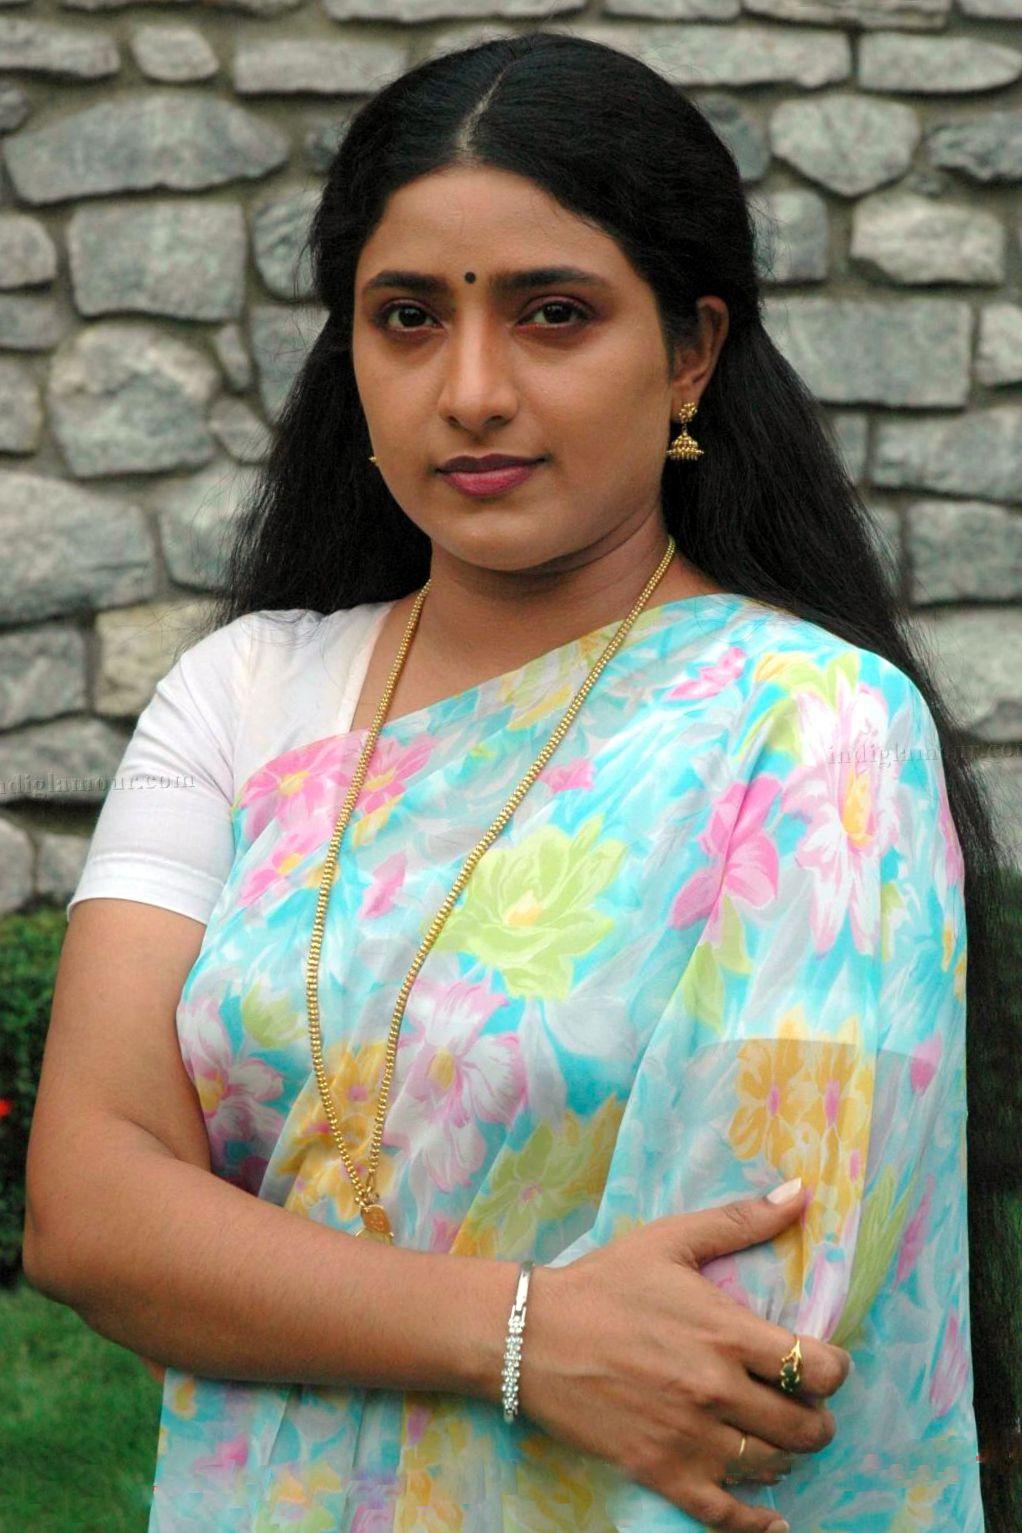 Hindi Mein Film Sexy